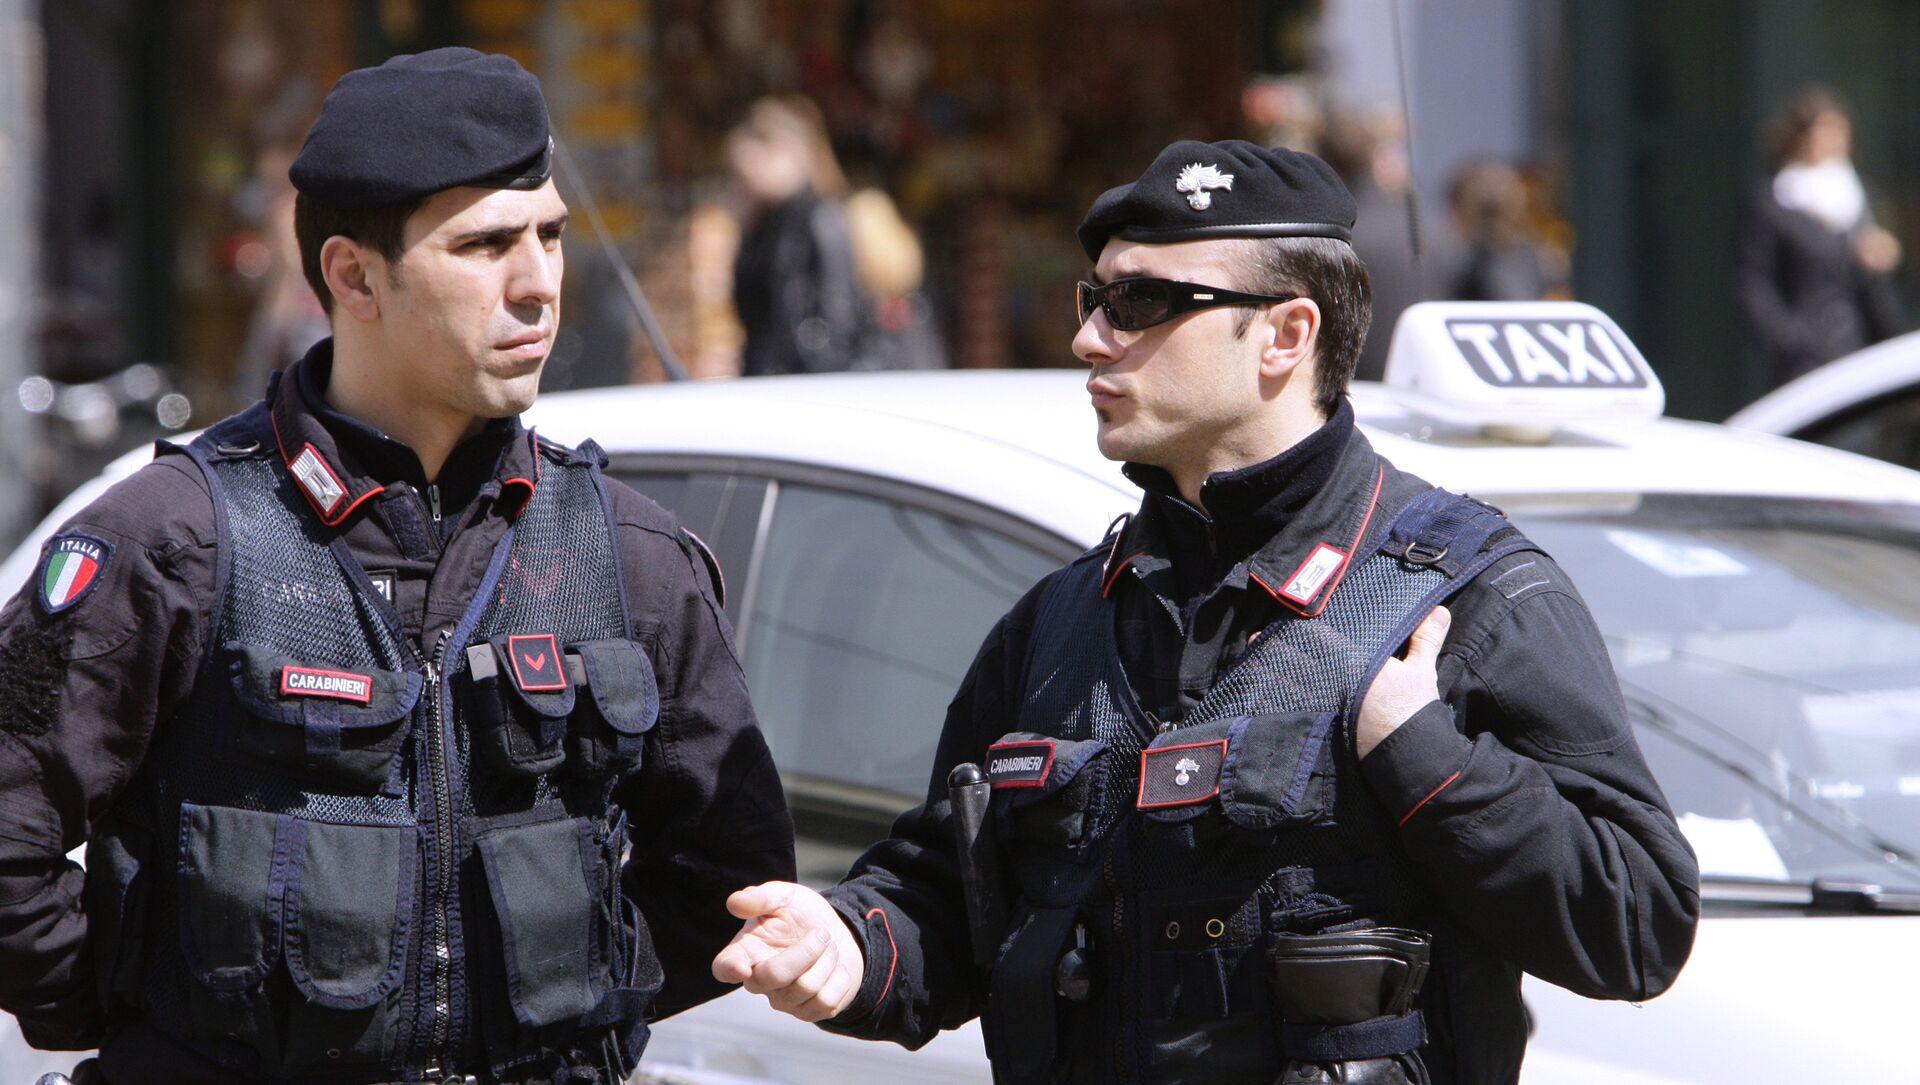 La polizia italiana - Sputnik Italia, 1920, 10.02.2021